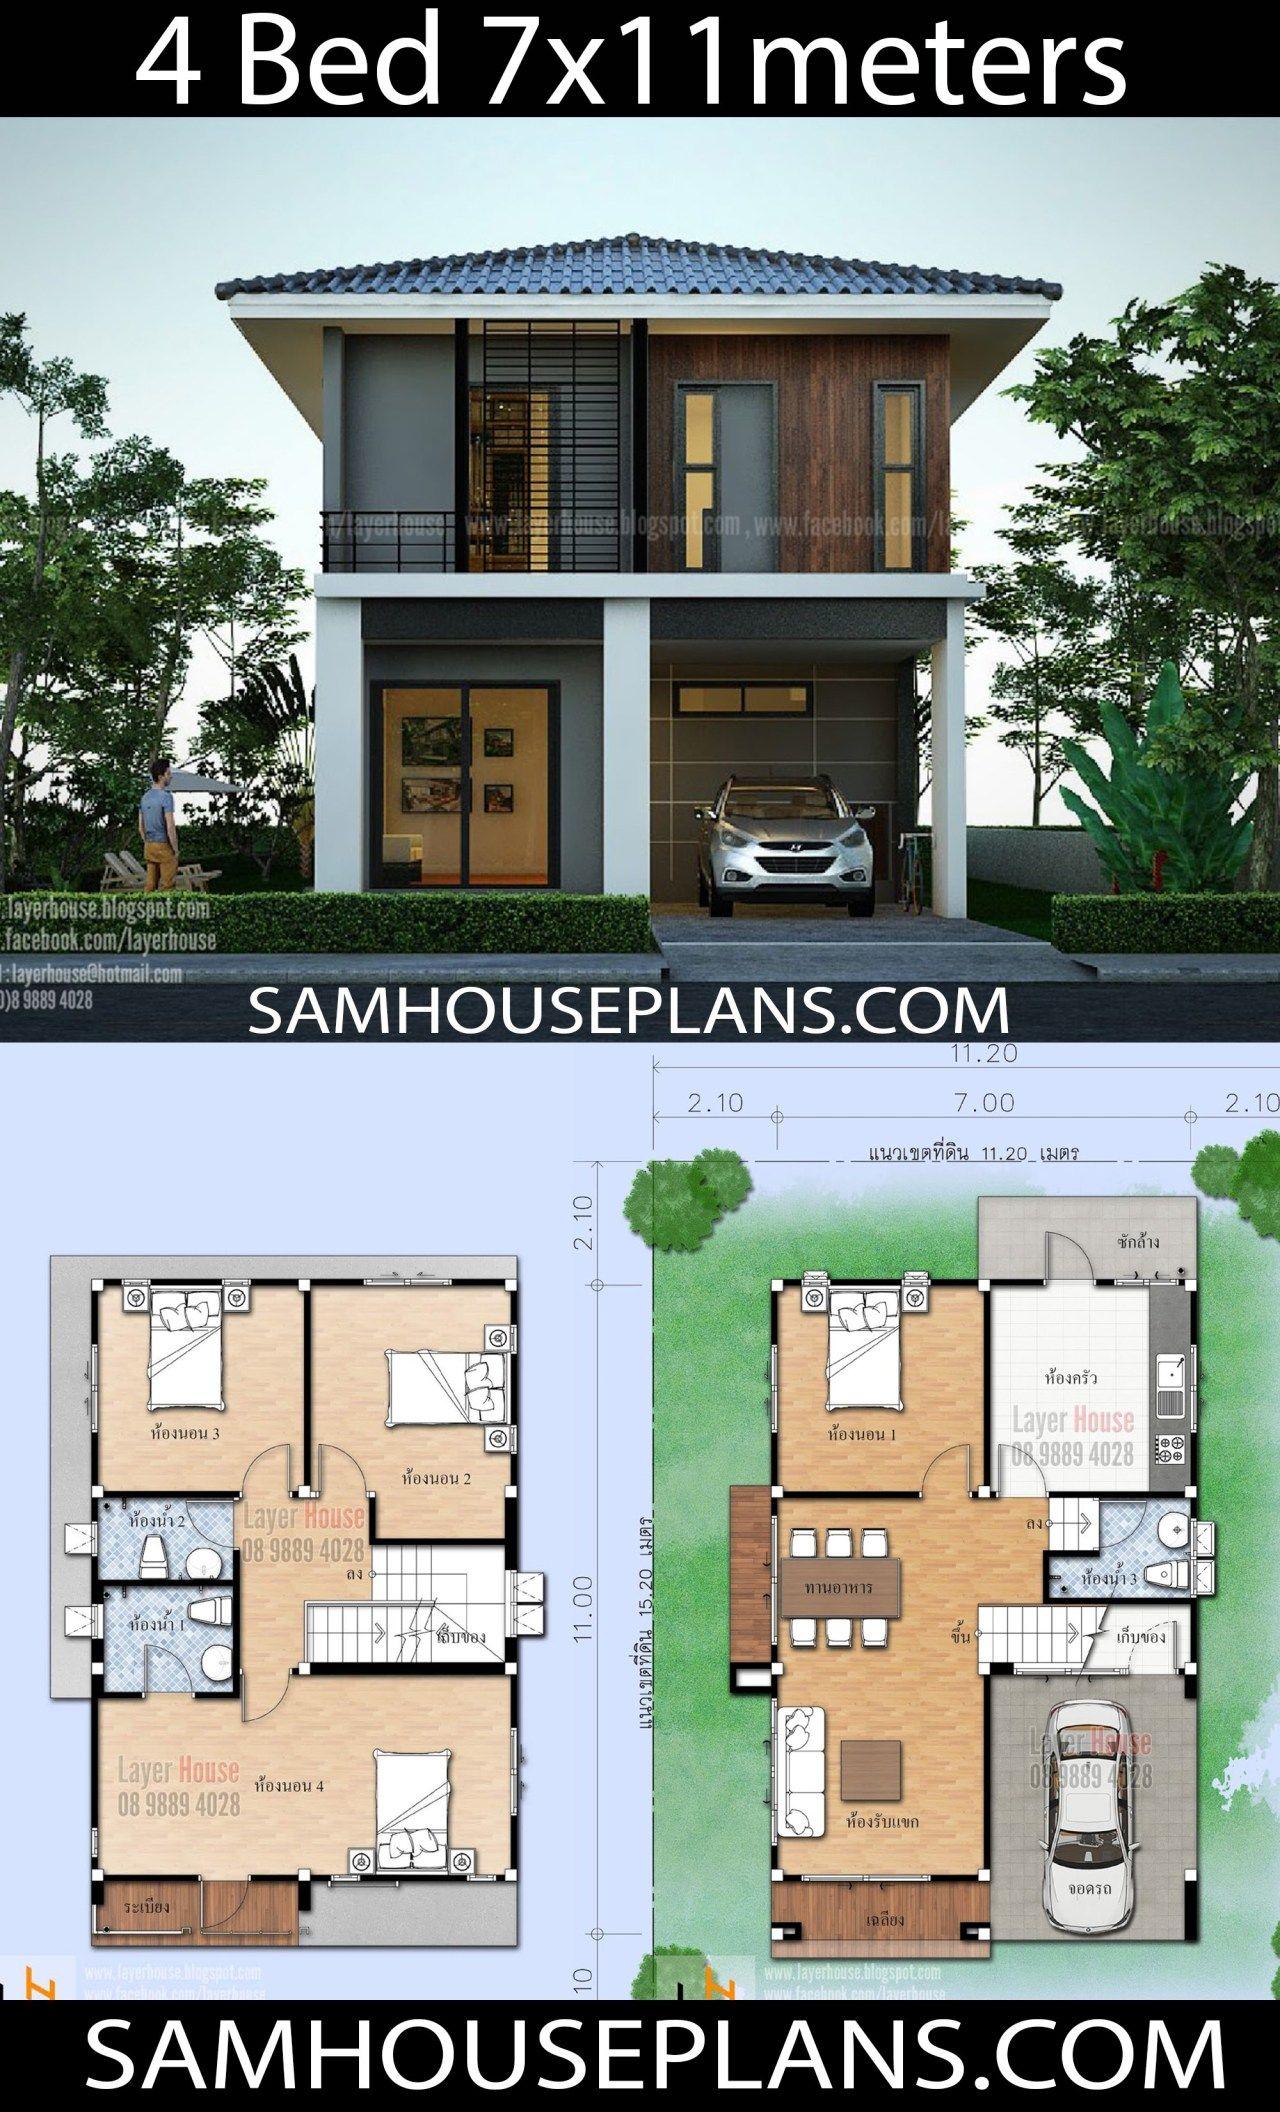 House Plans Idea 7x11 M With 4 Bedrooms Sam House Plans House Construction Plan Model House Plan Architectural House Plans